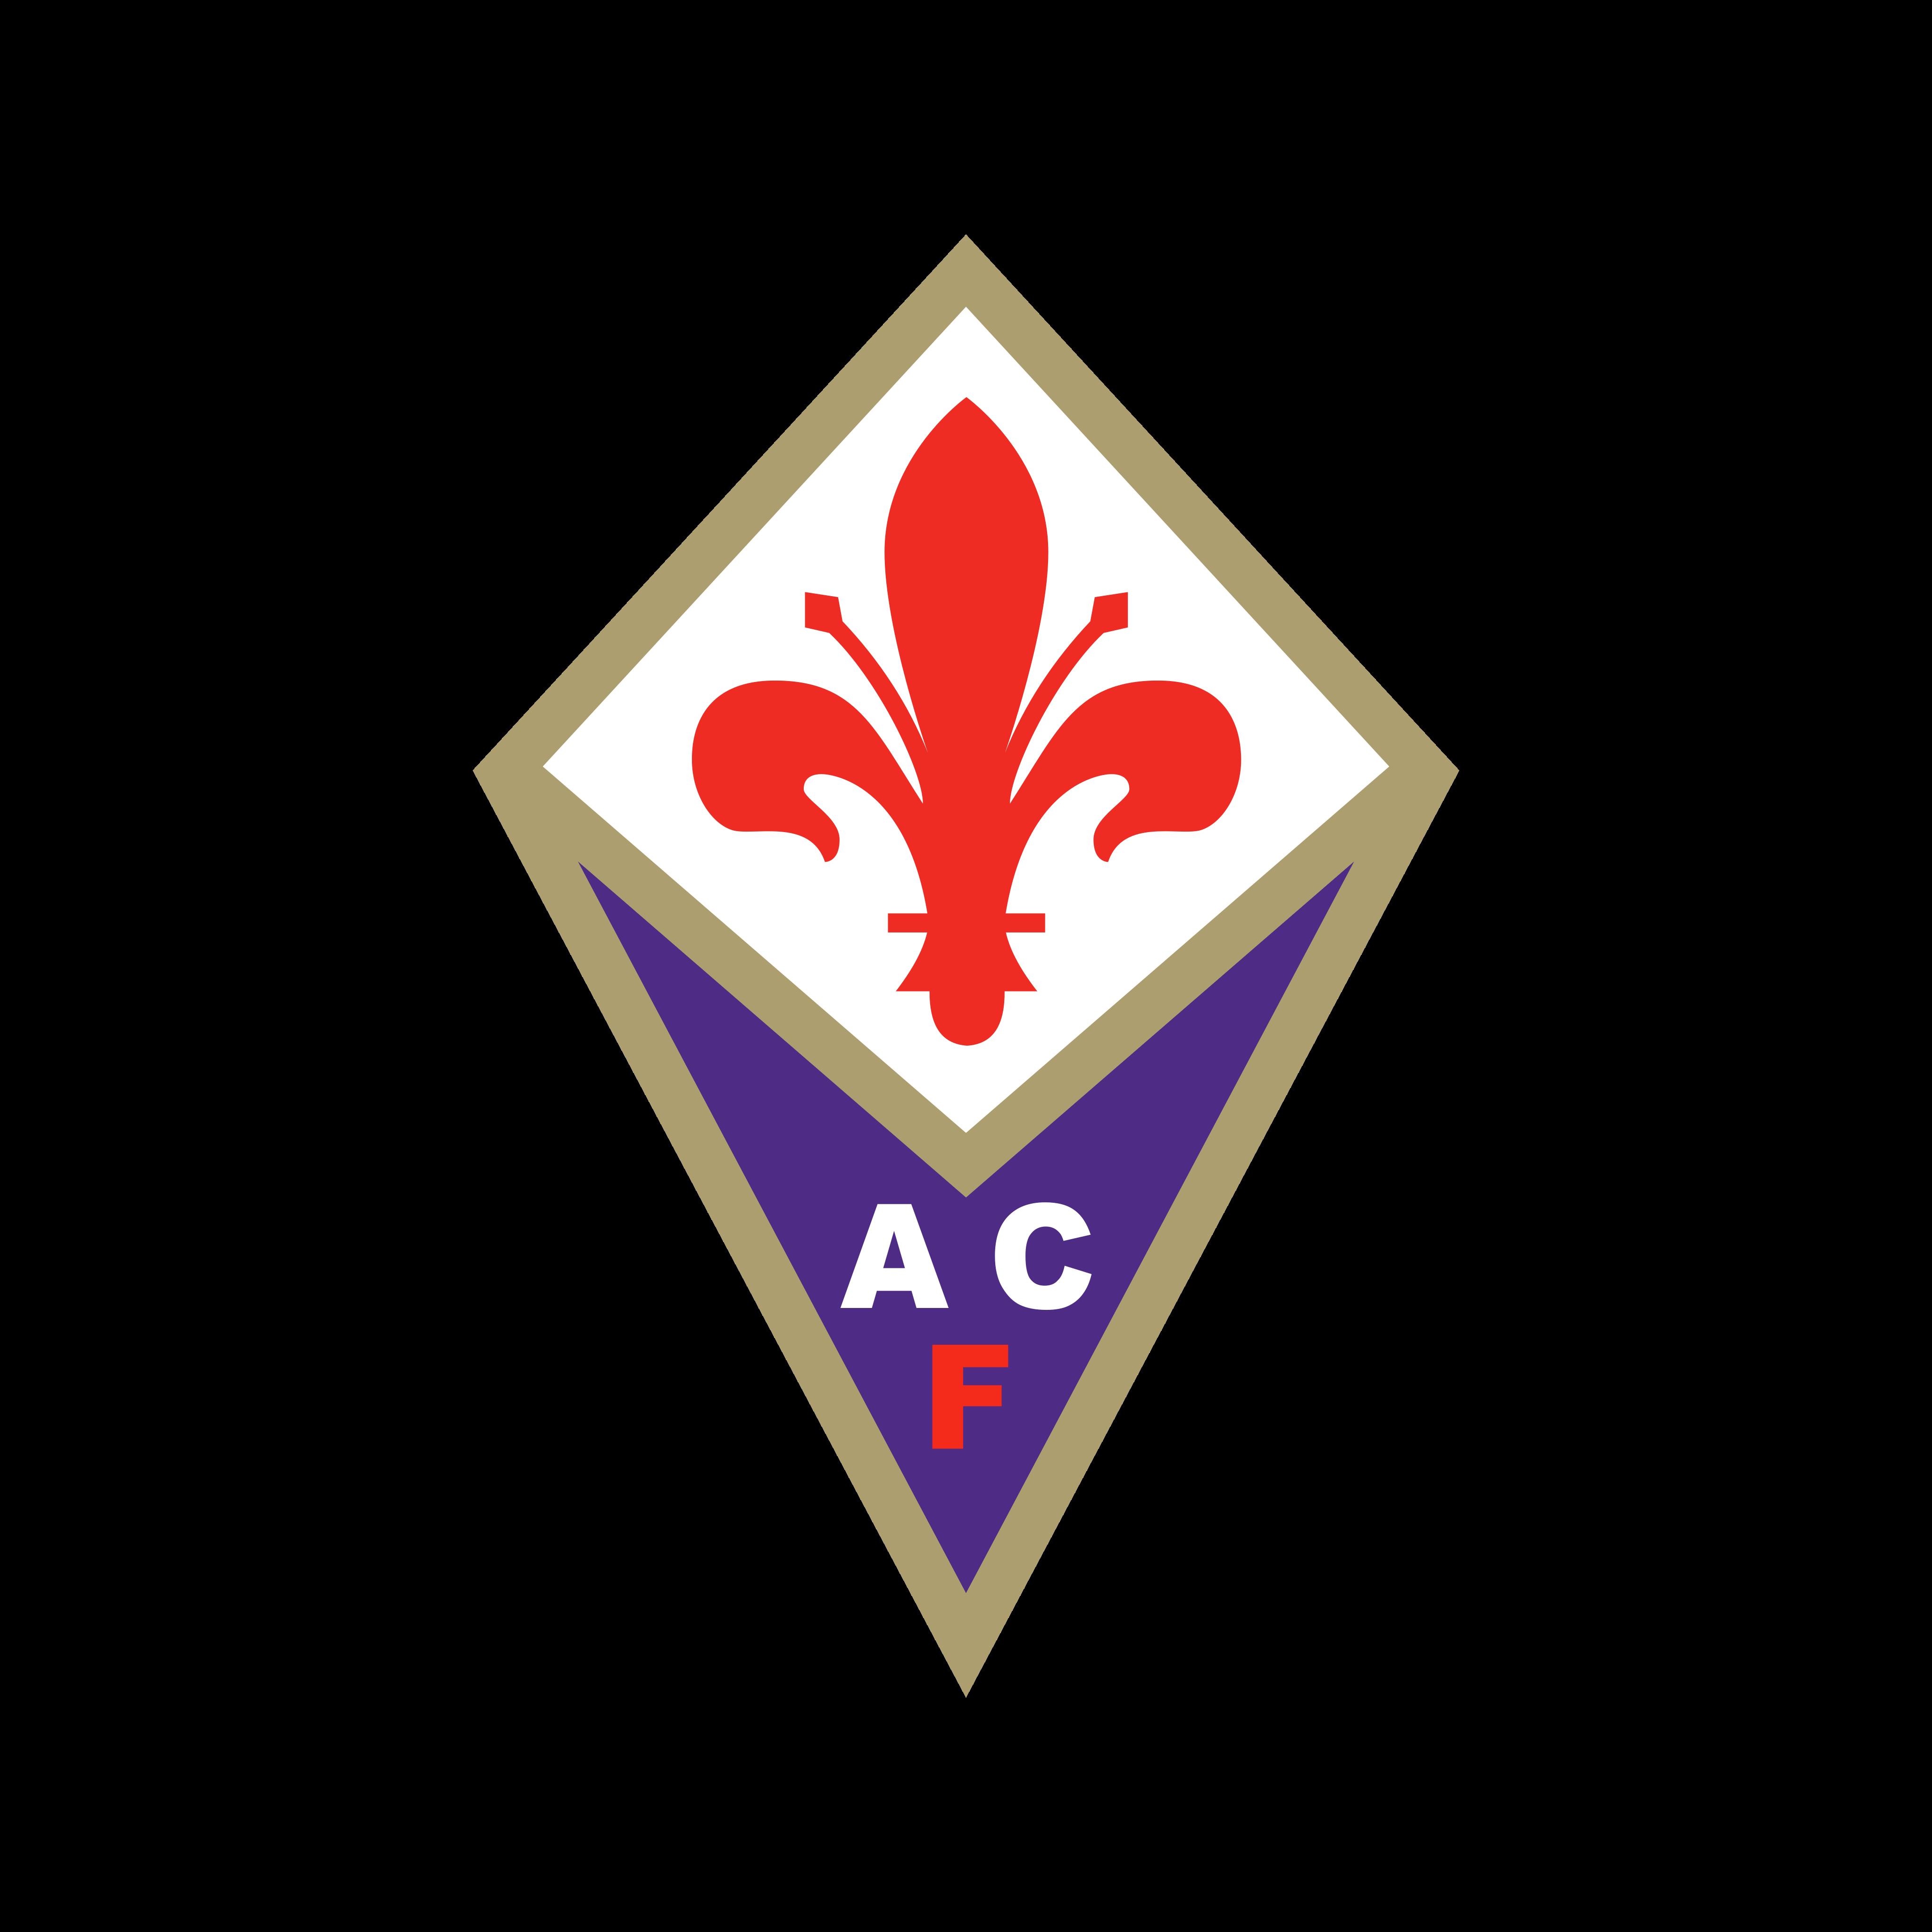 fiorentina logo 0 - ACF Fiorentina Logo